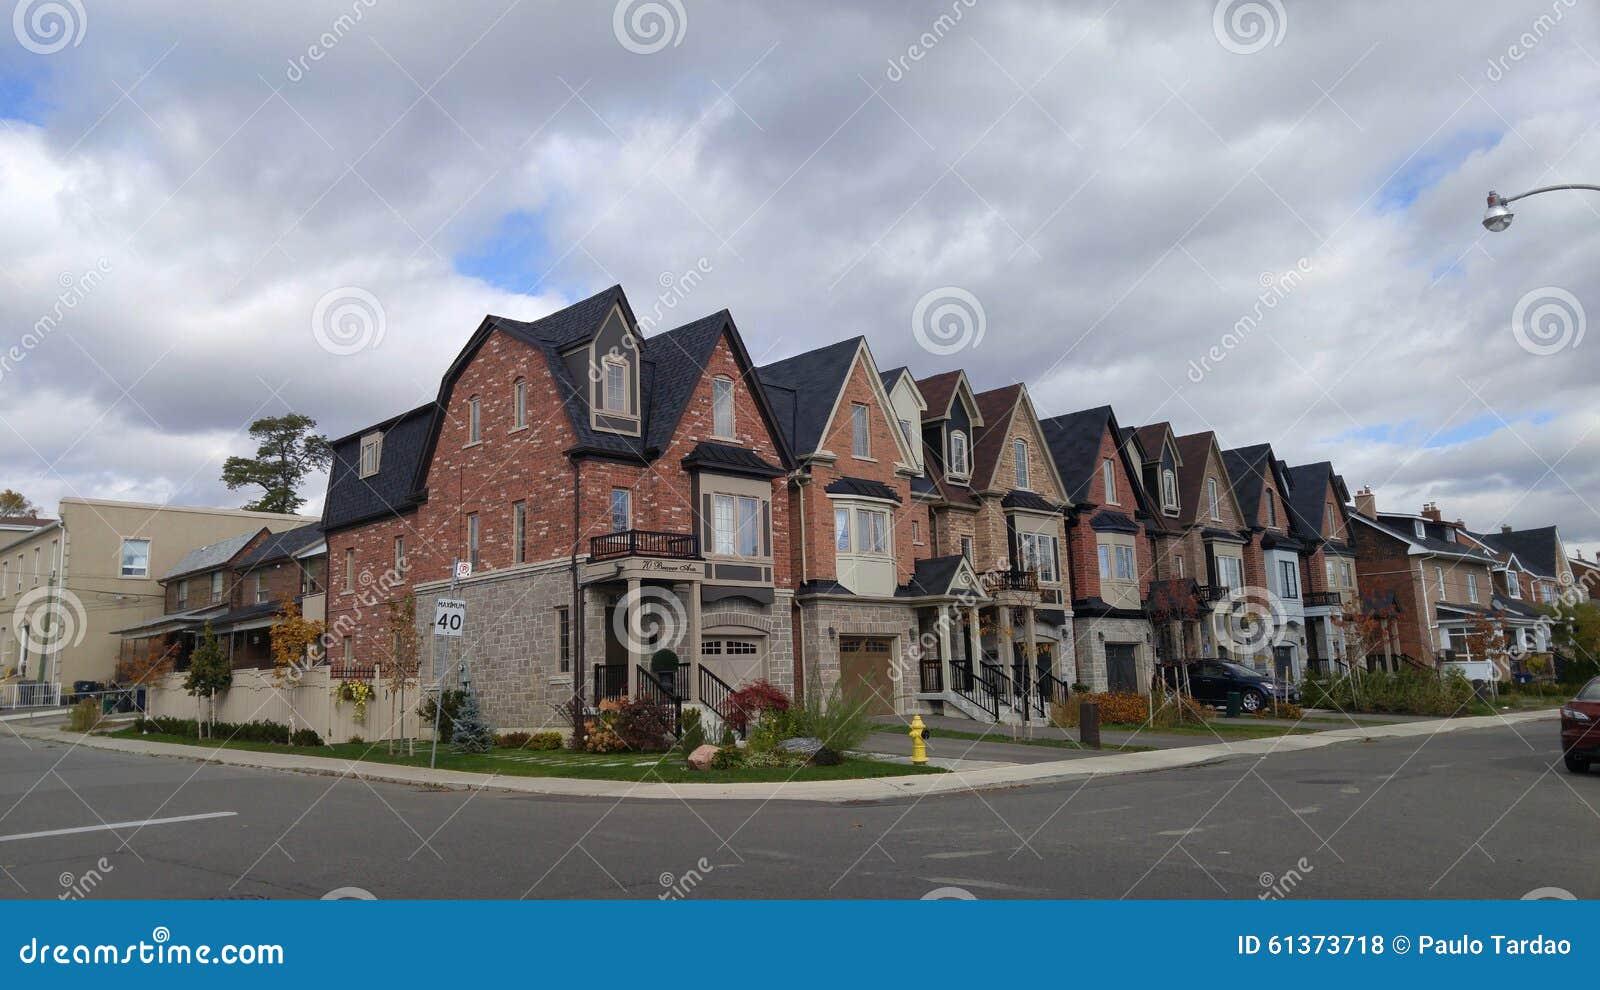 New Million Dollar Homes in Torontos West End